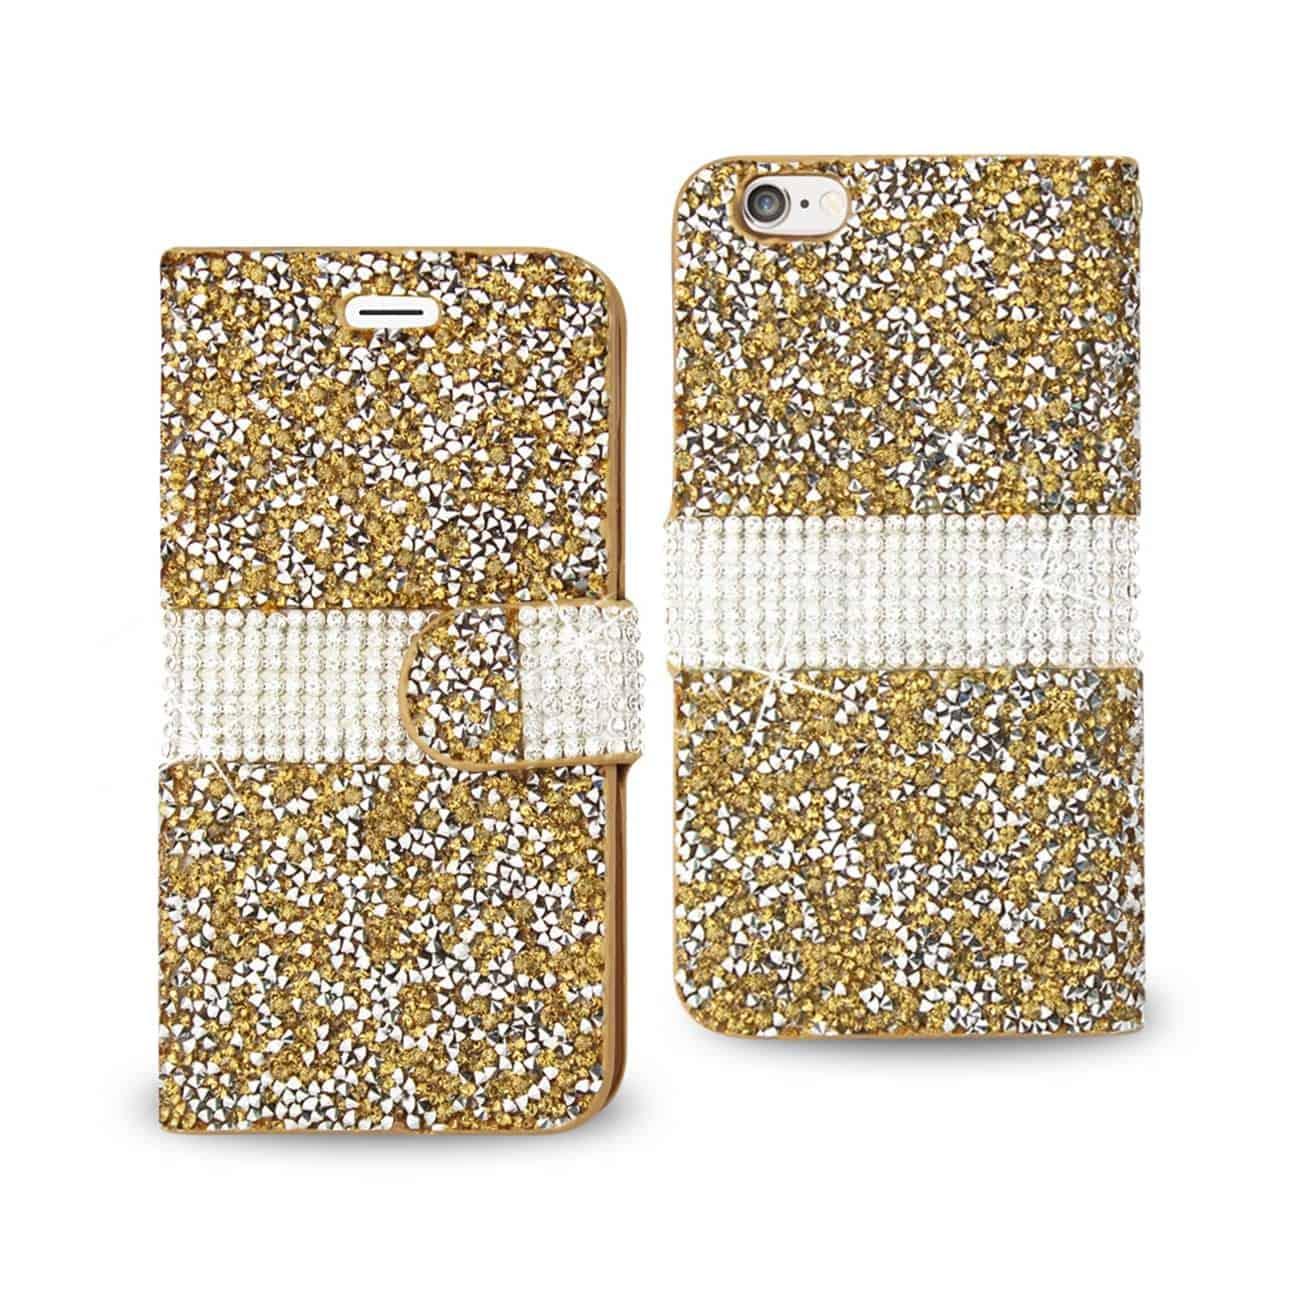 IPHONE 6 DIAMOND RHINESTONE WALLET CASE IN GOLD